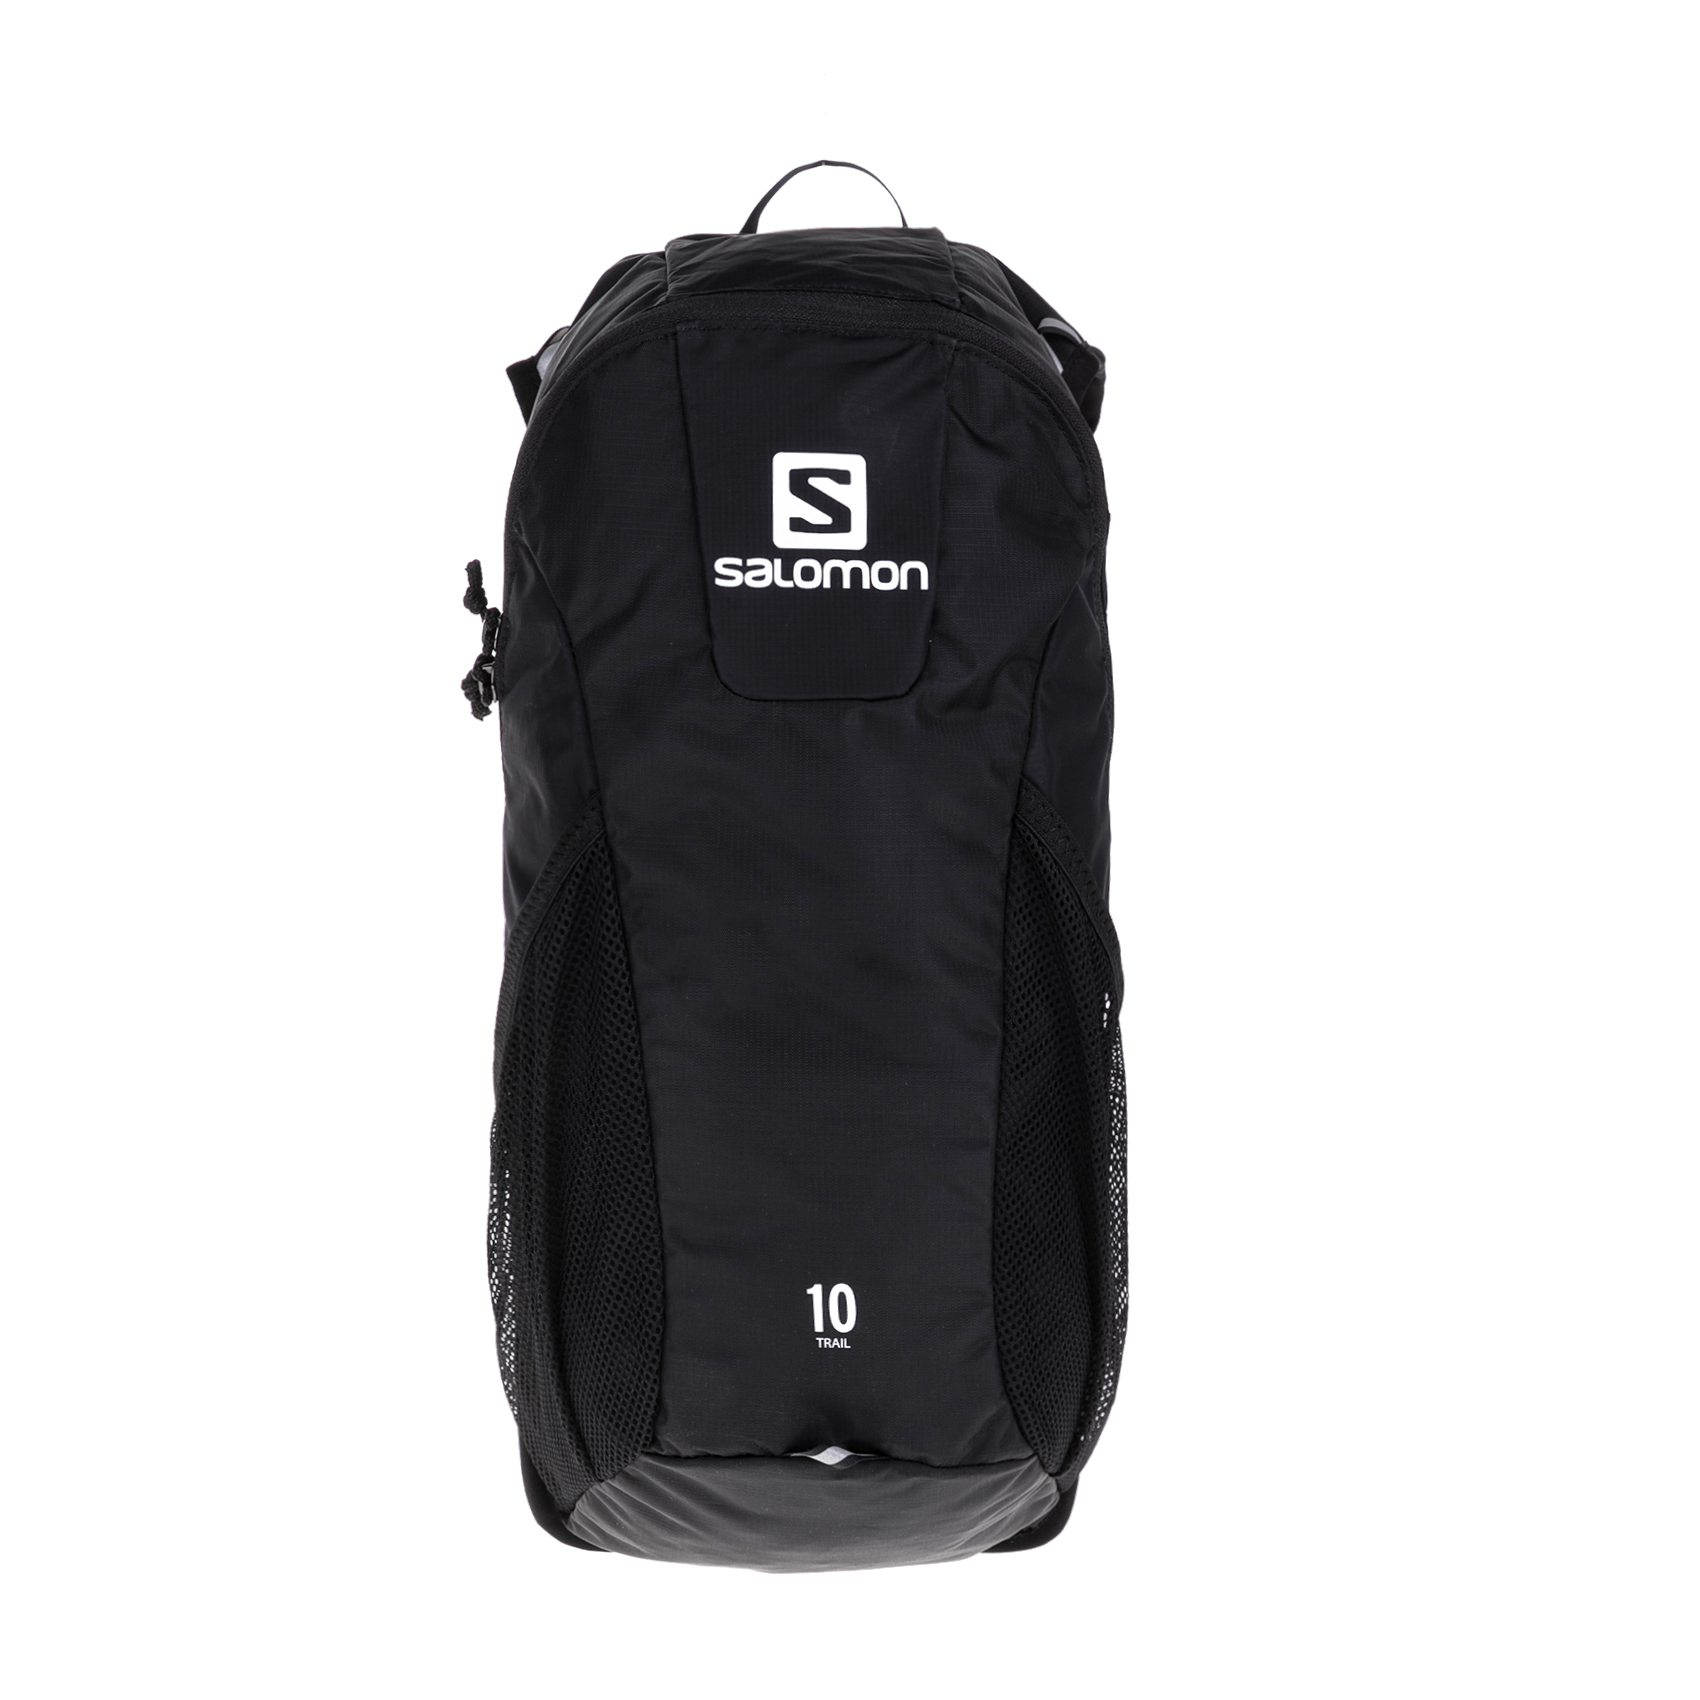 ed5a30479d SALOMON – Σακίδιο πλάτης SALOMON PACKS BAG TRAIL 10 μαύρο